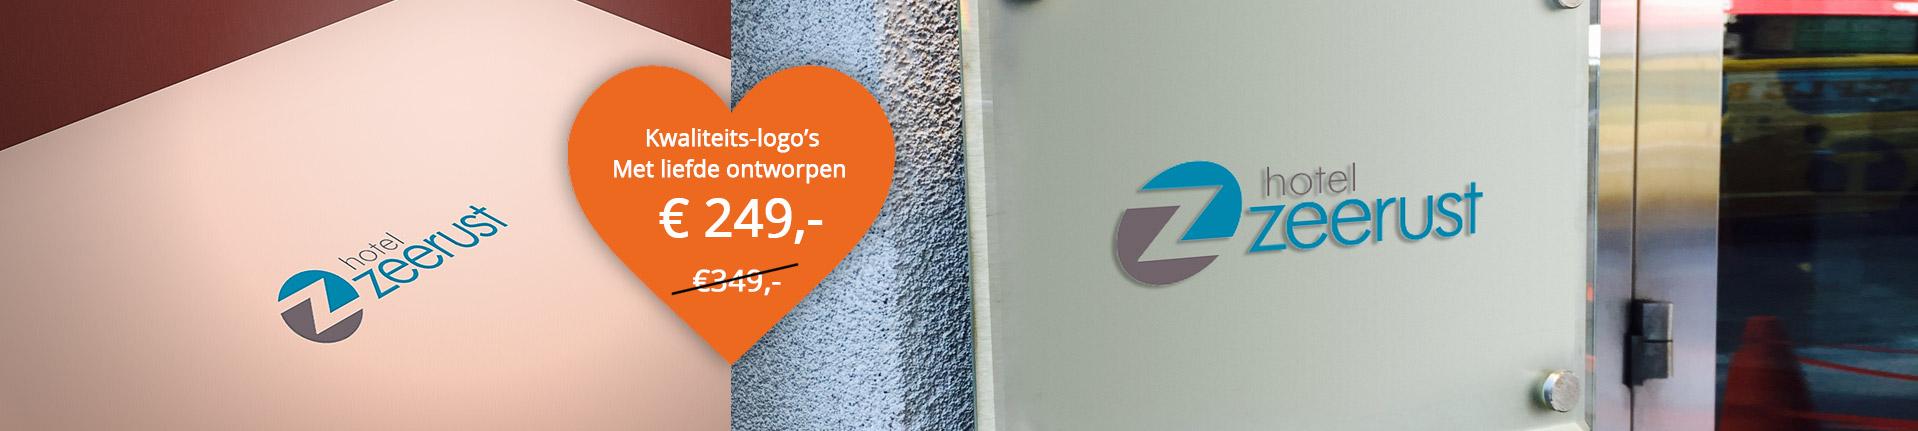 logo-laten-maken-utrecht